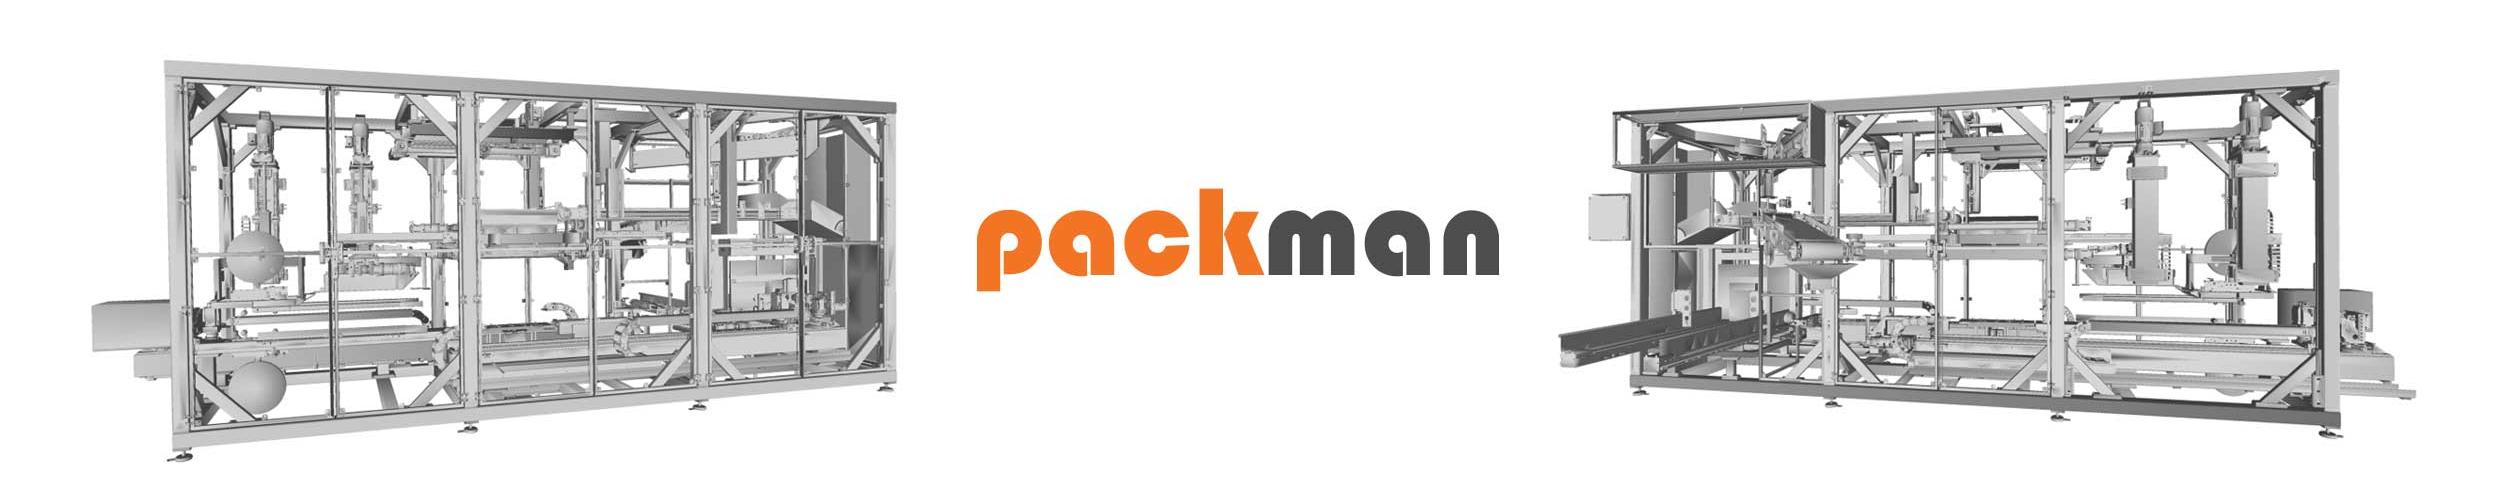 Packman